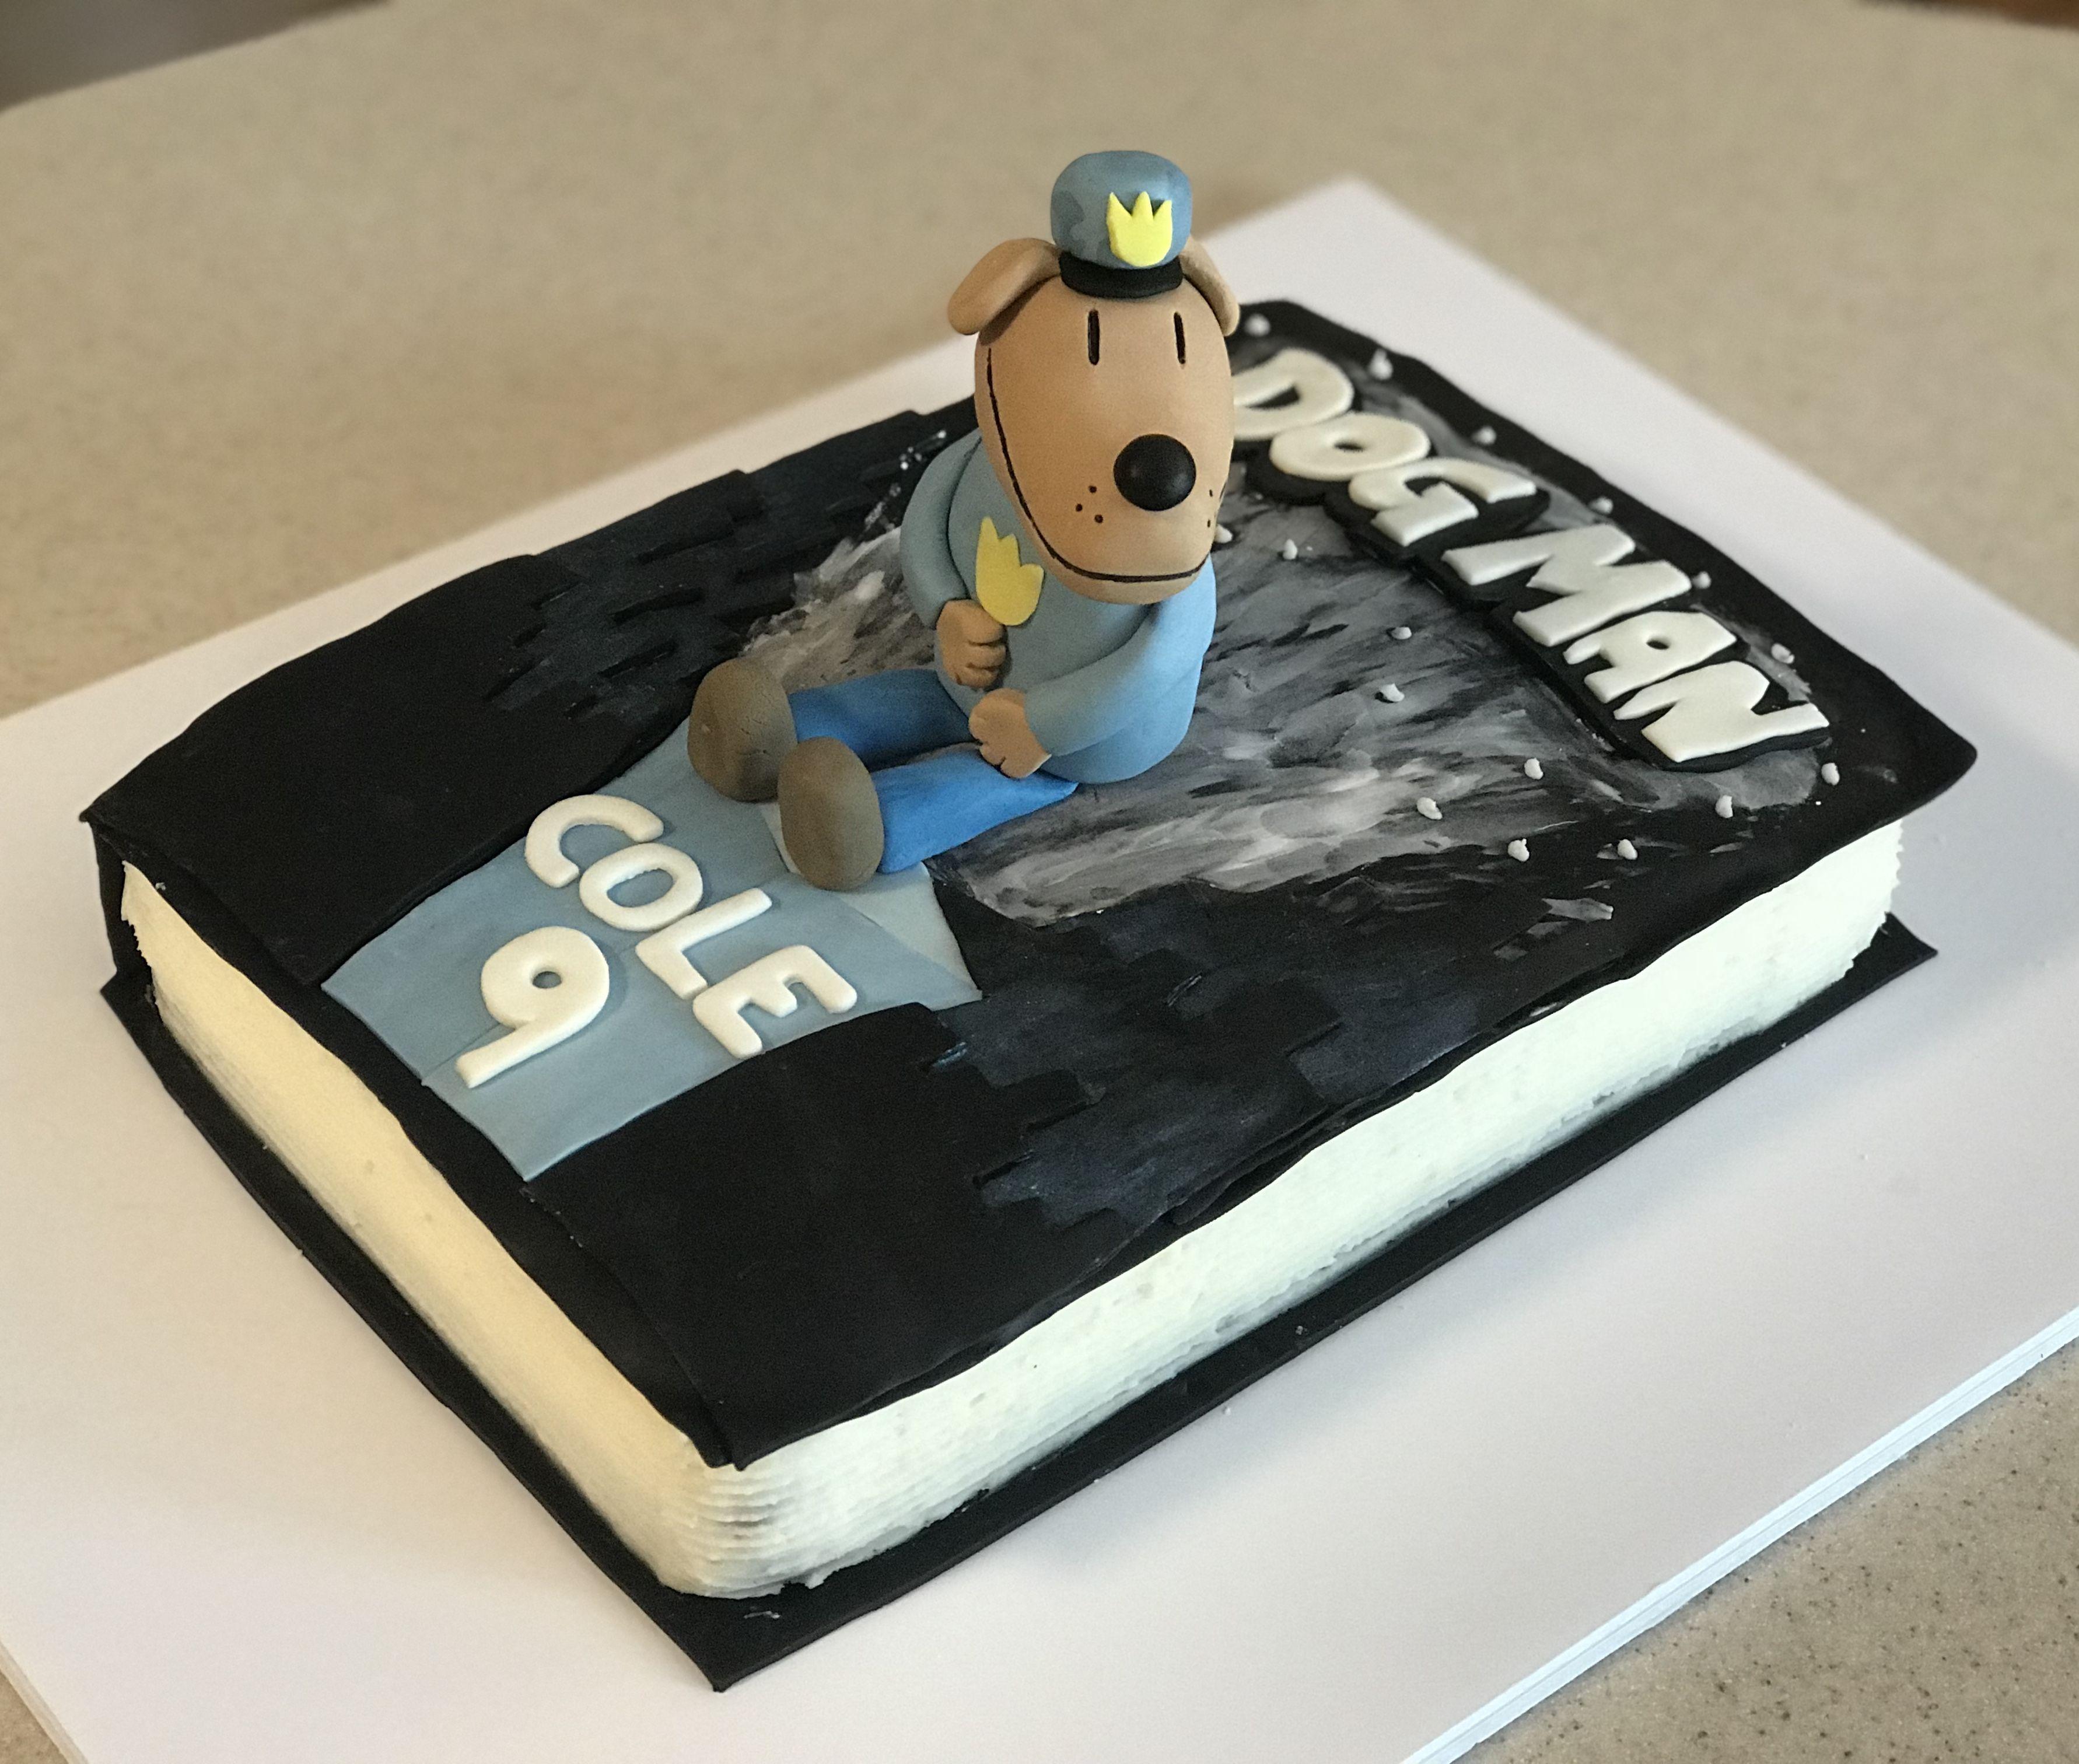 Remarkable Dogman Birthday Cake With Images Cake Designs Birthday Mens Personalised Birthday Cards Veneteletsinfo